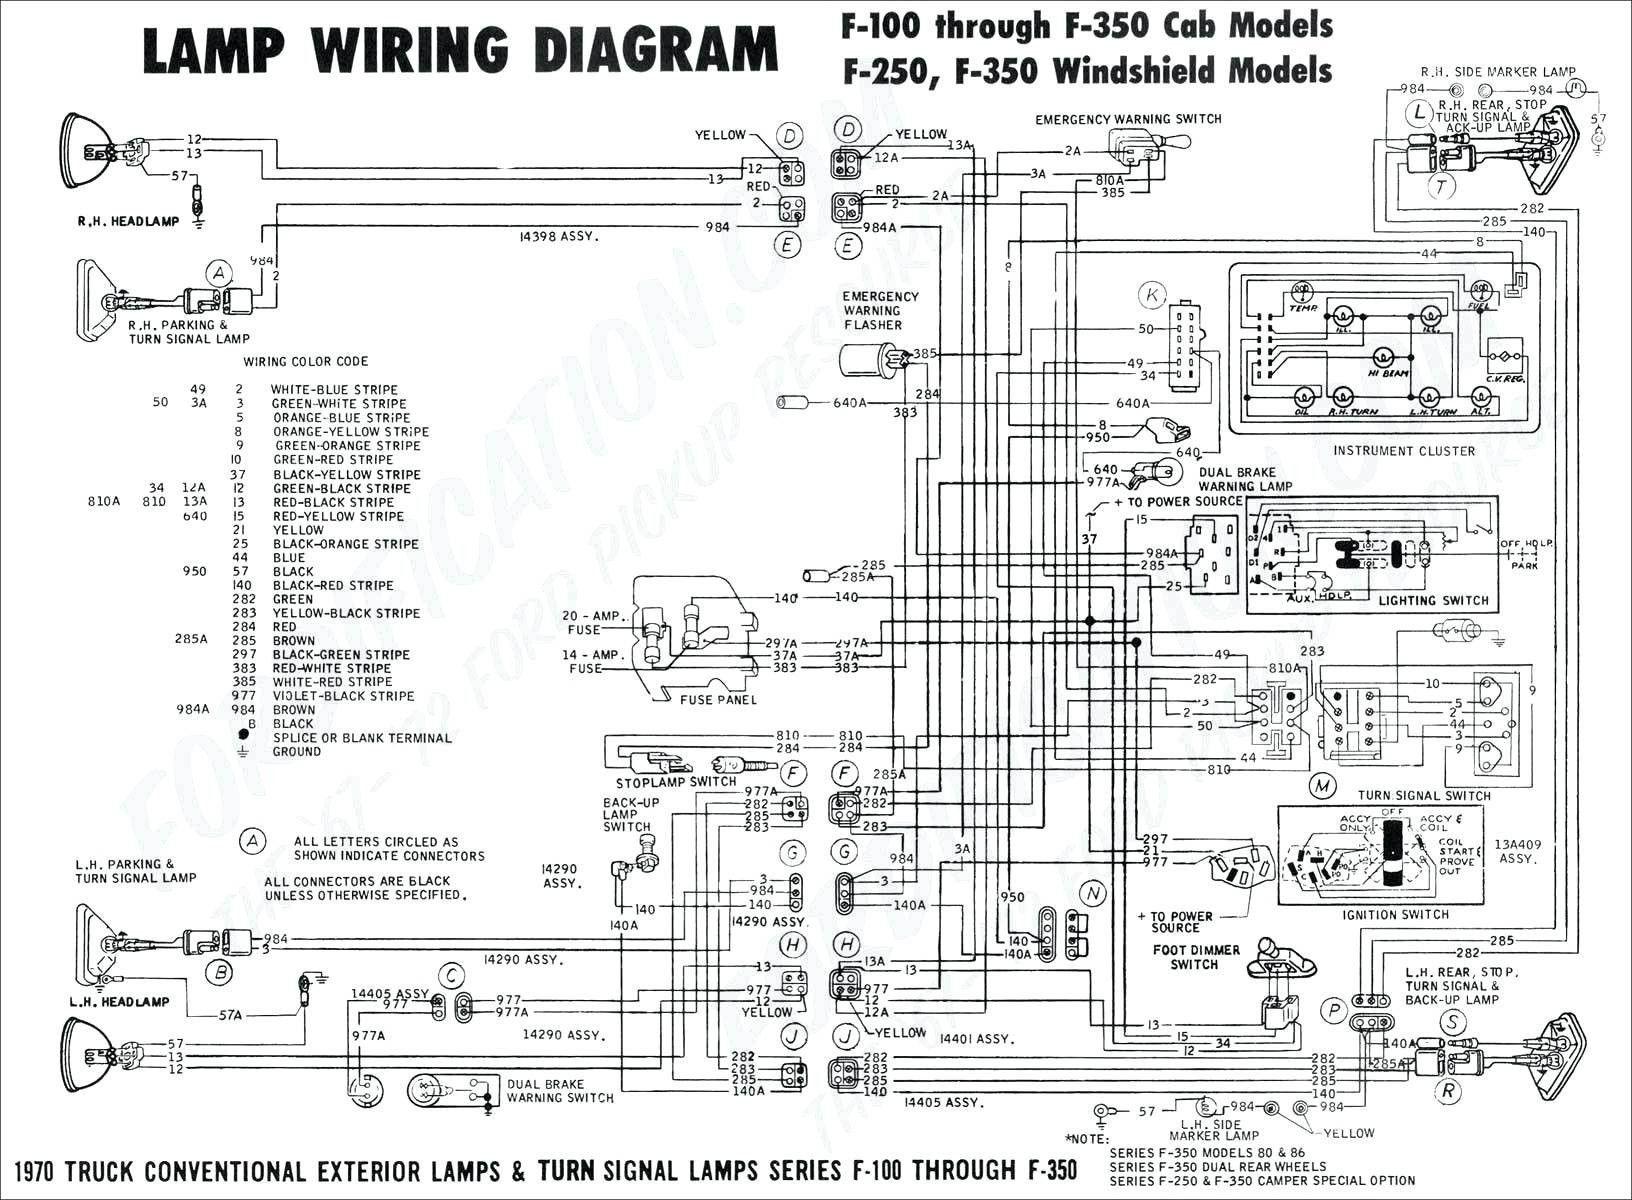 1997 Nissan Pickup Engine Diagram Trailer Wiring Diagram Electrical Wiring Diagram Circuit Diagram